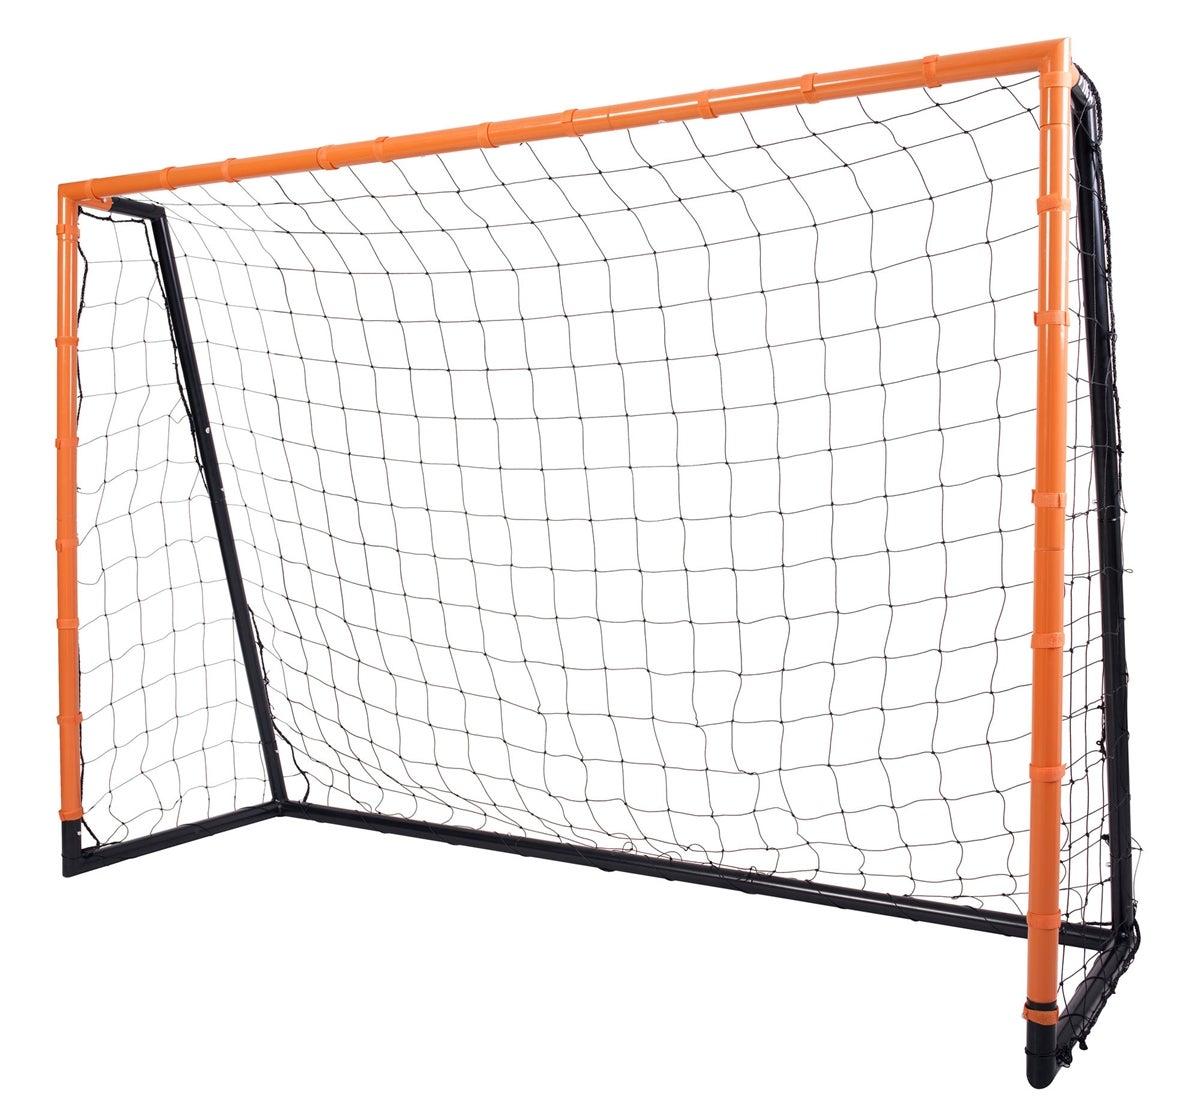 Stiga - Scorer Football Goal 210 x 150 x 70 cm (84-2635-13)